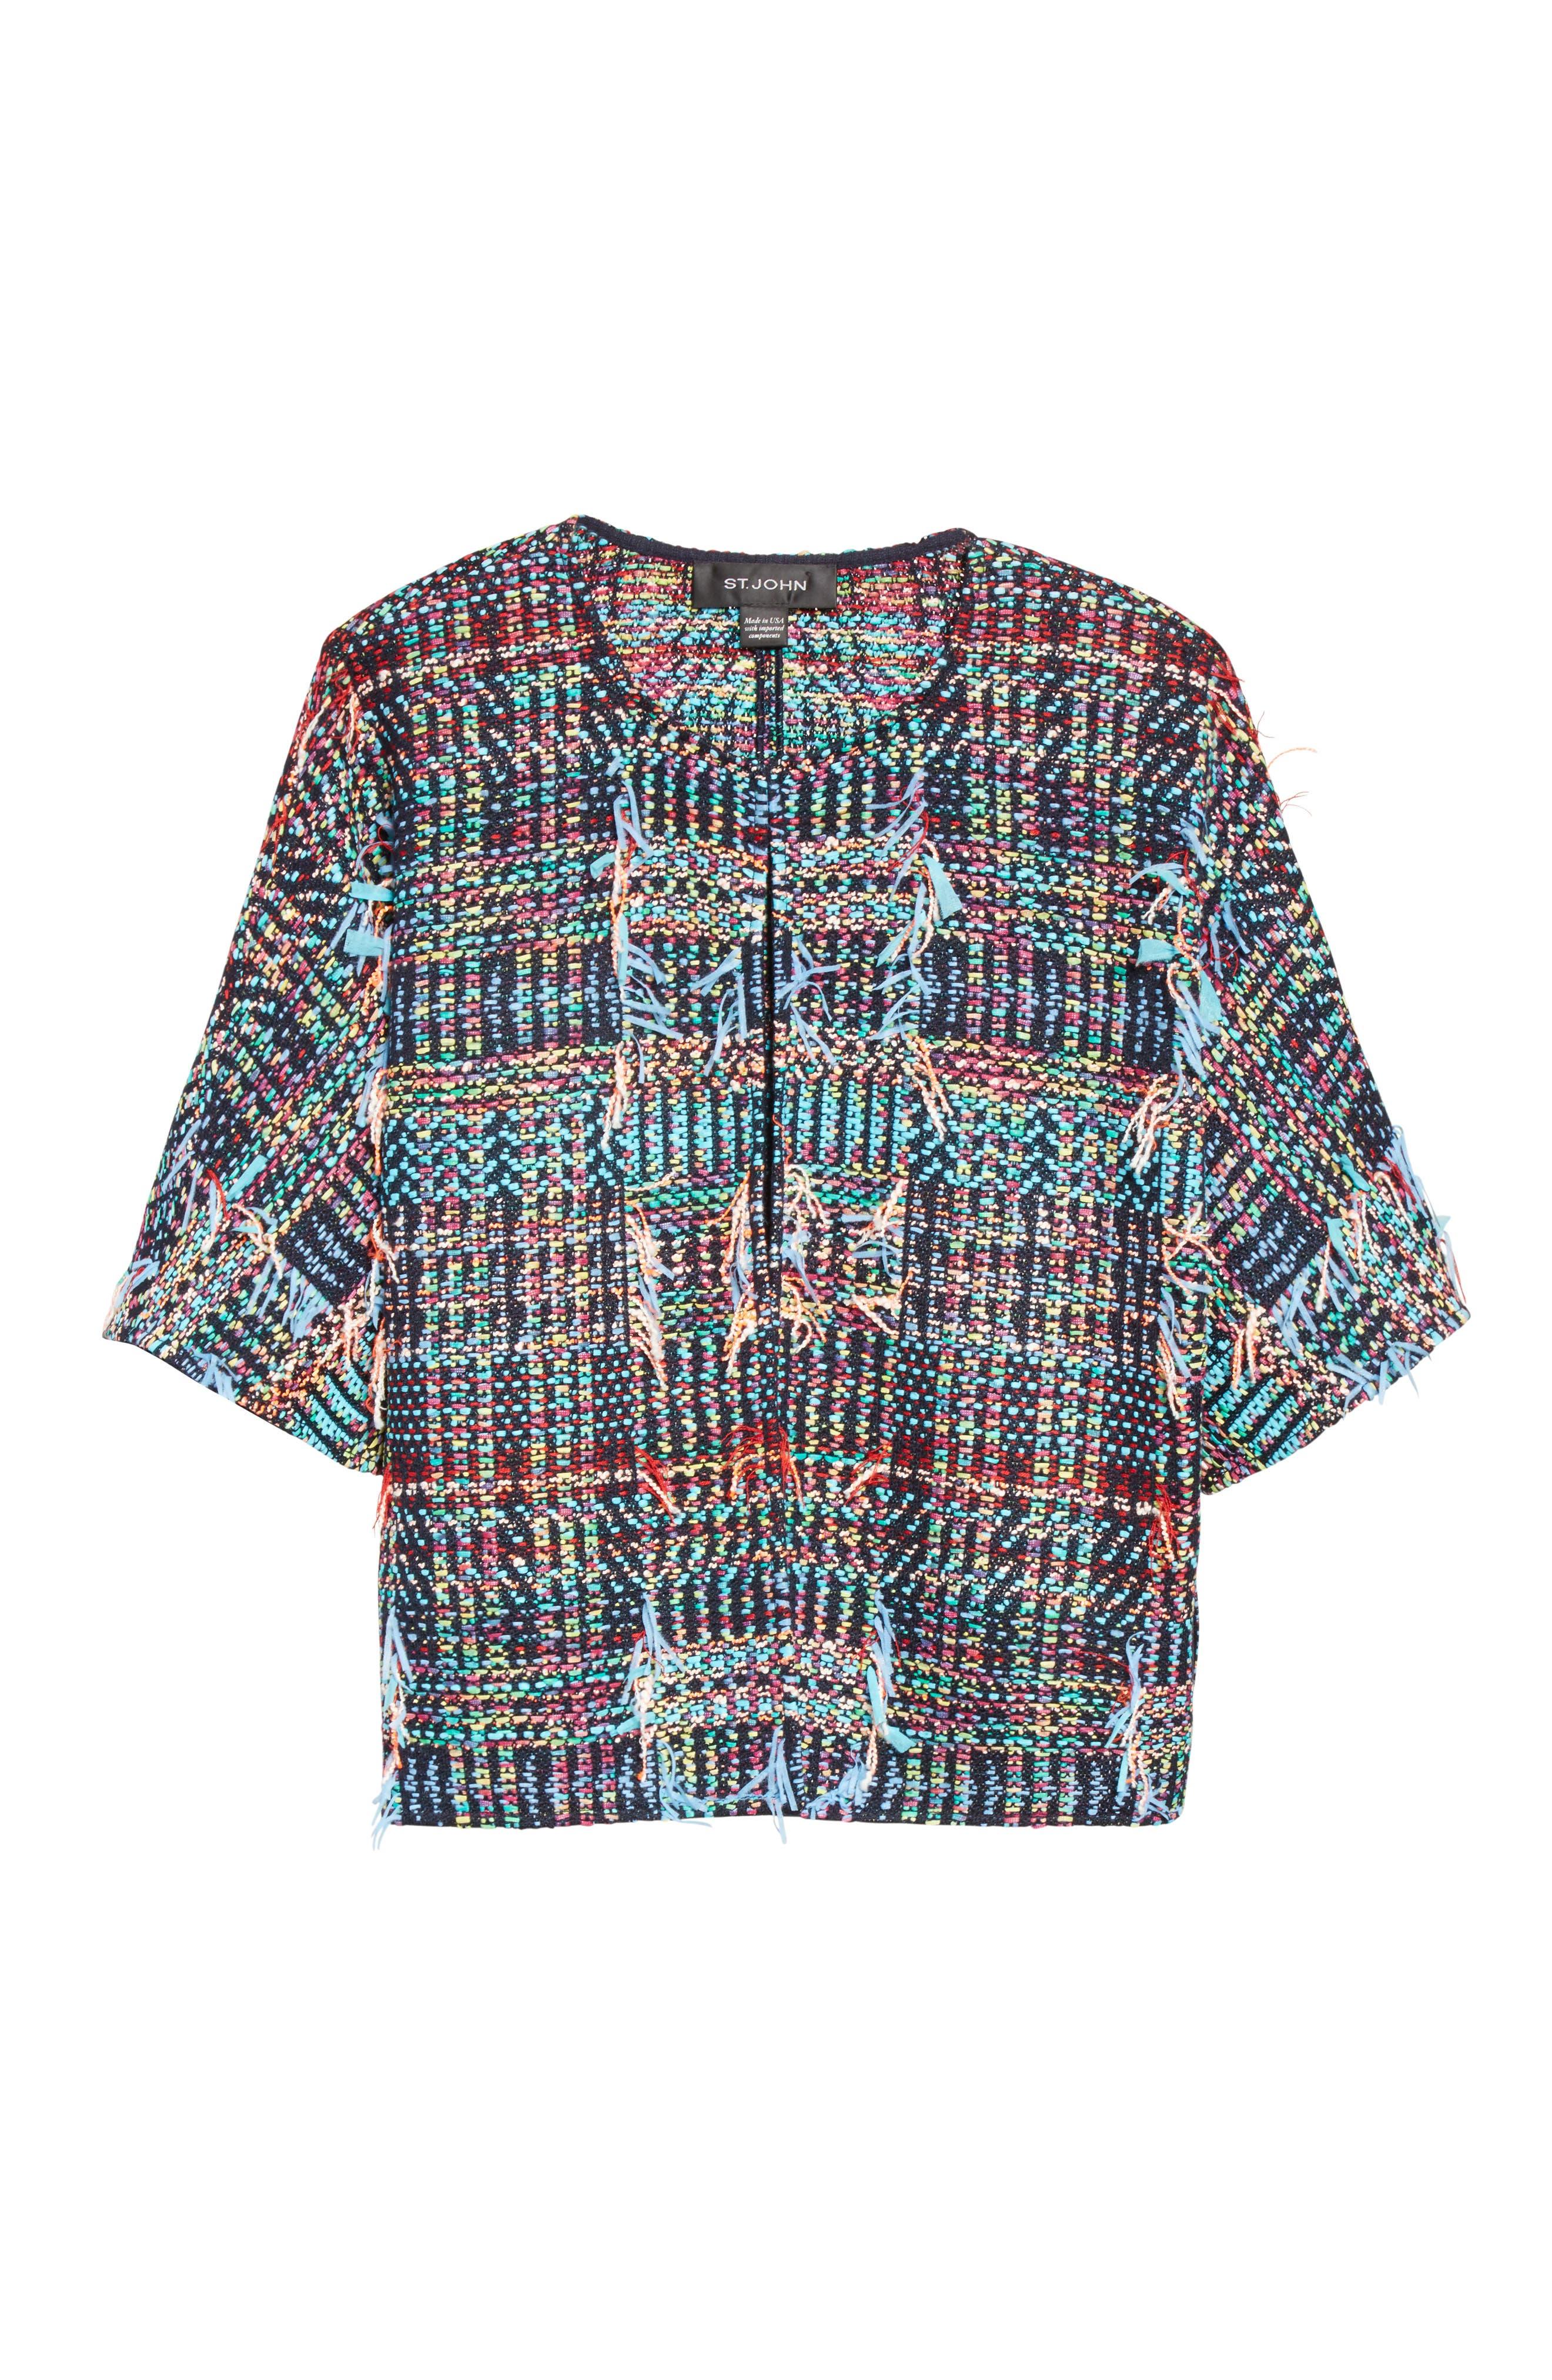 Dara Fringe Knit Jacket,                             Alternate thumbnail 7, color,                             Navy Multi